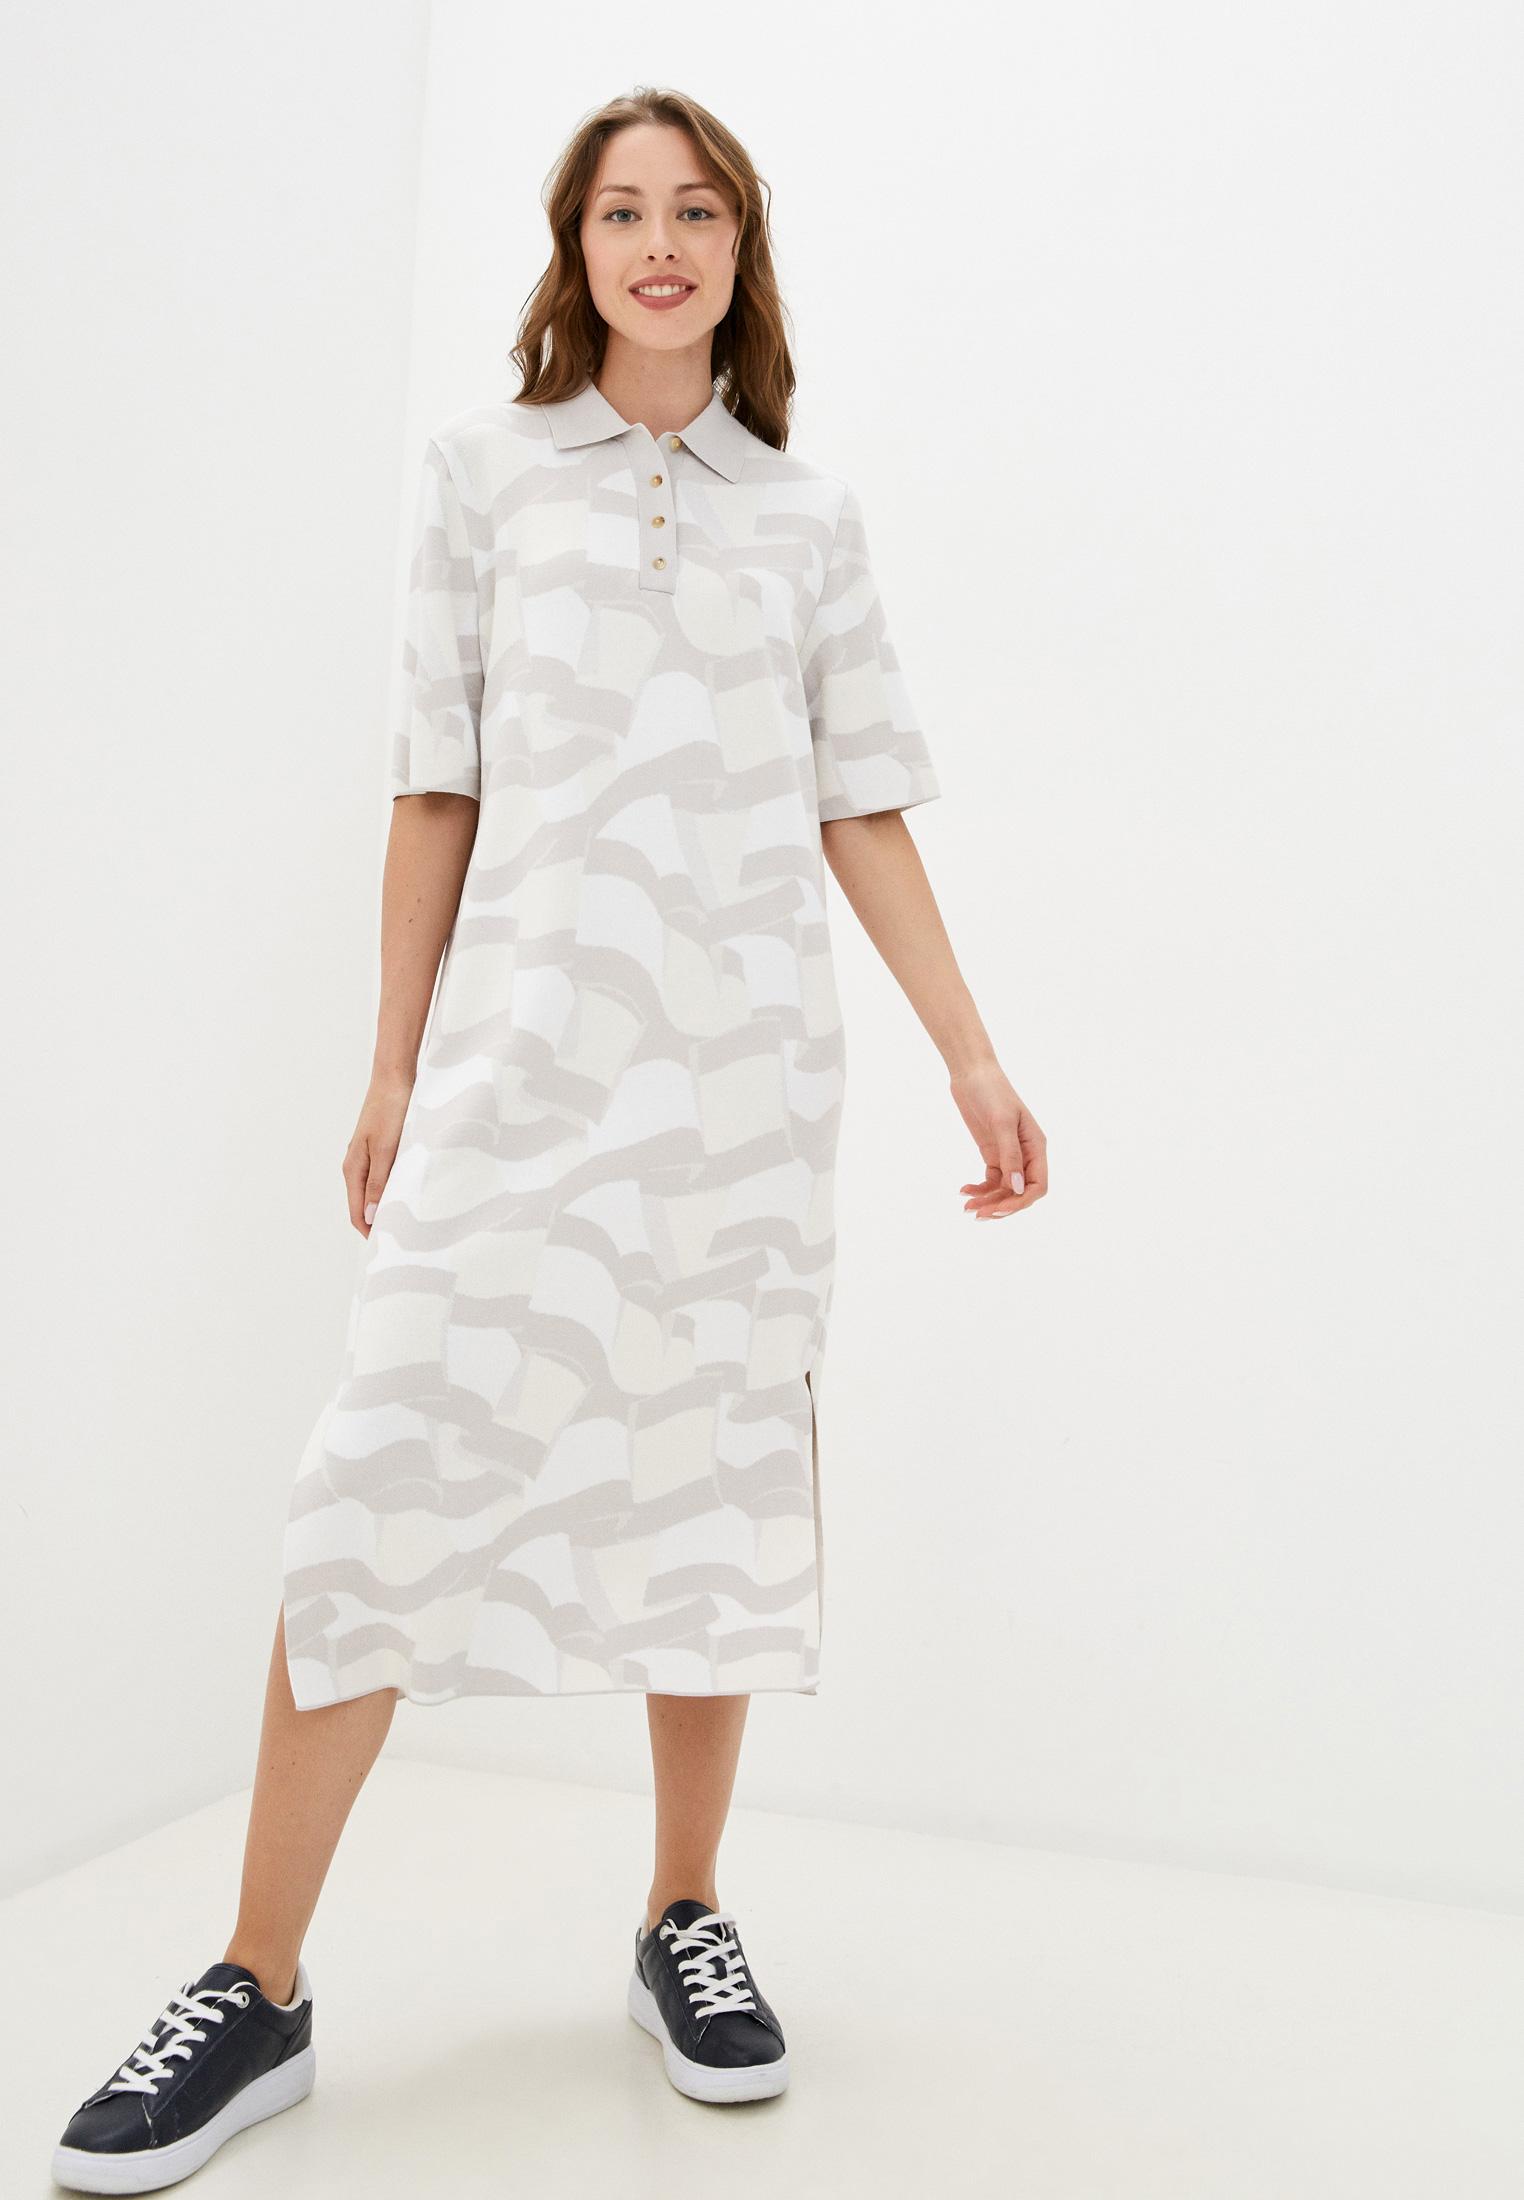 Платье Tommy Hilfiger (Томми Хилфигер) WW0WW31226